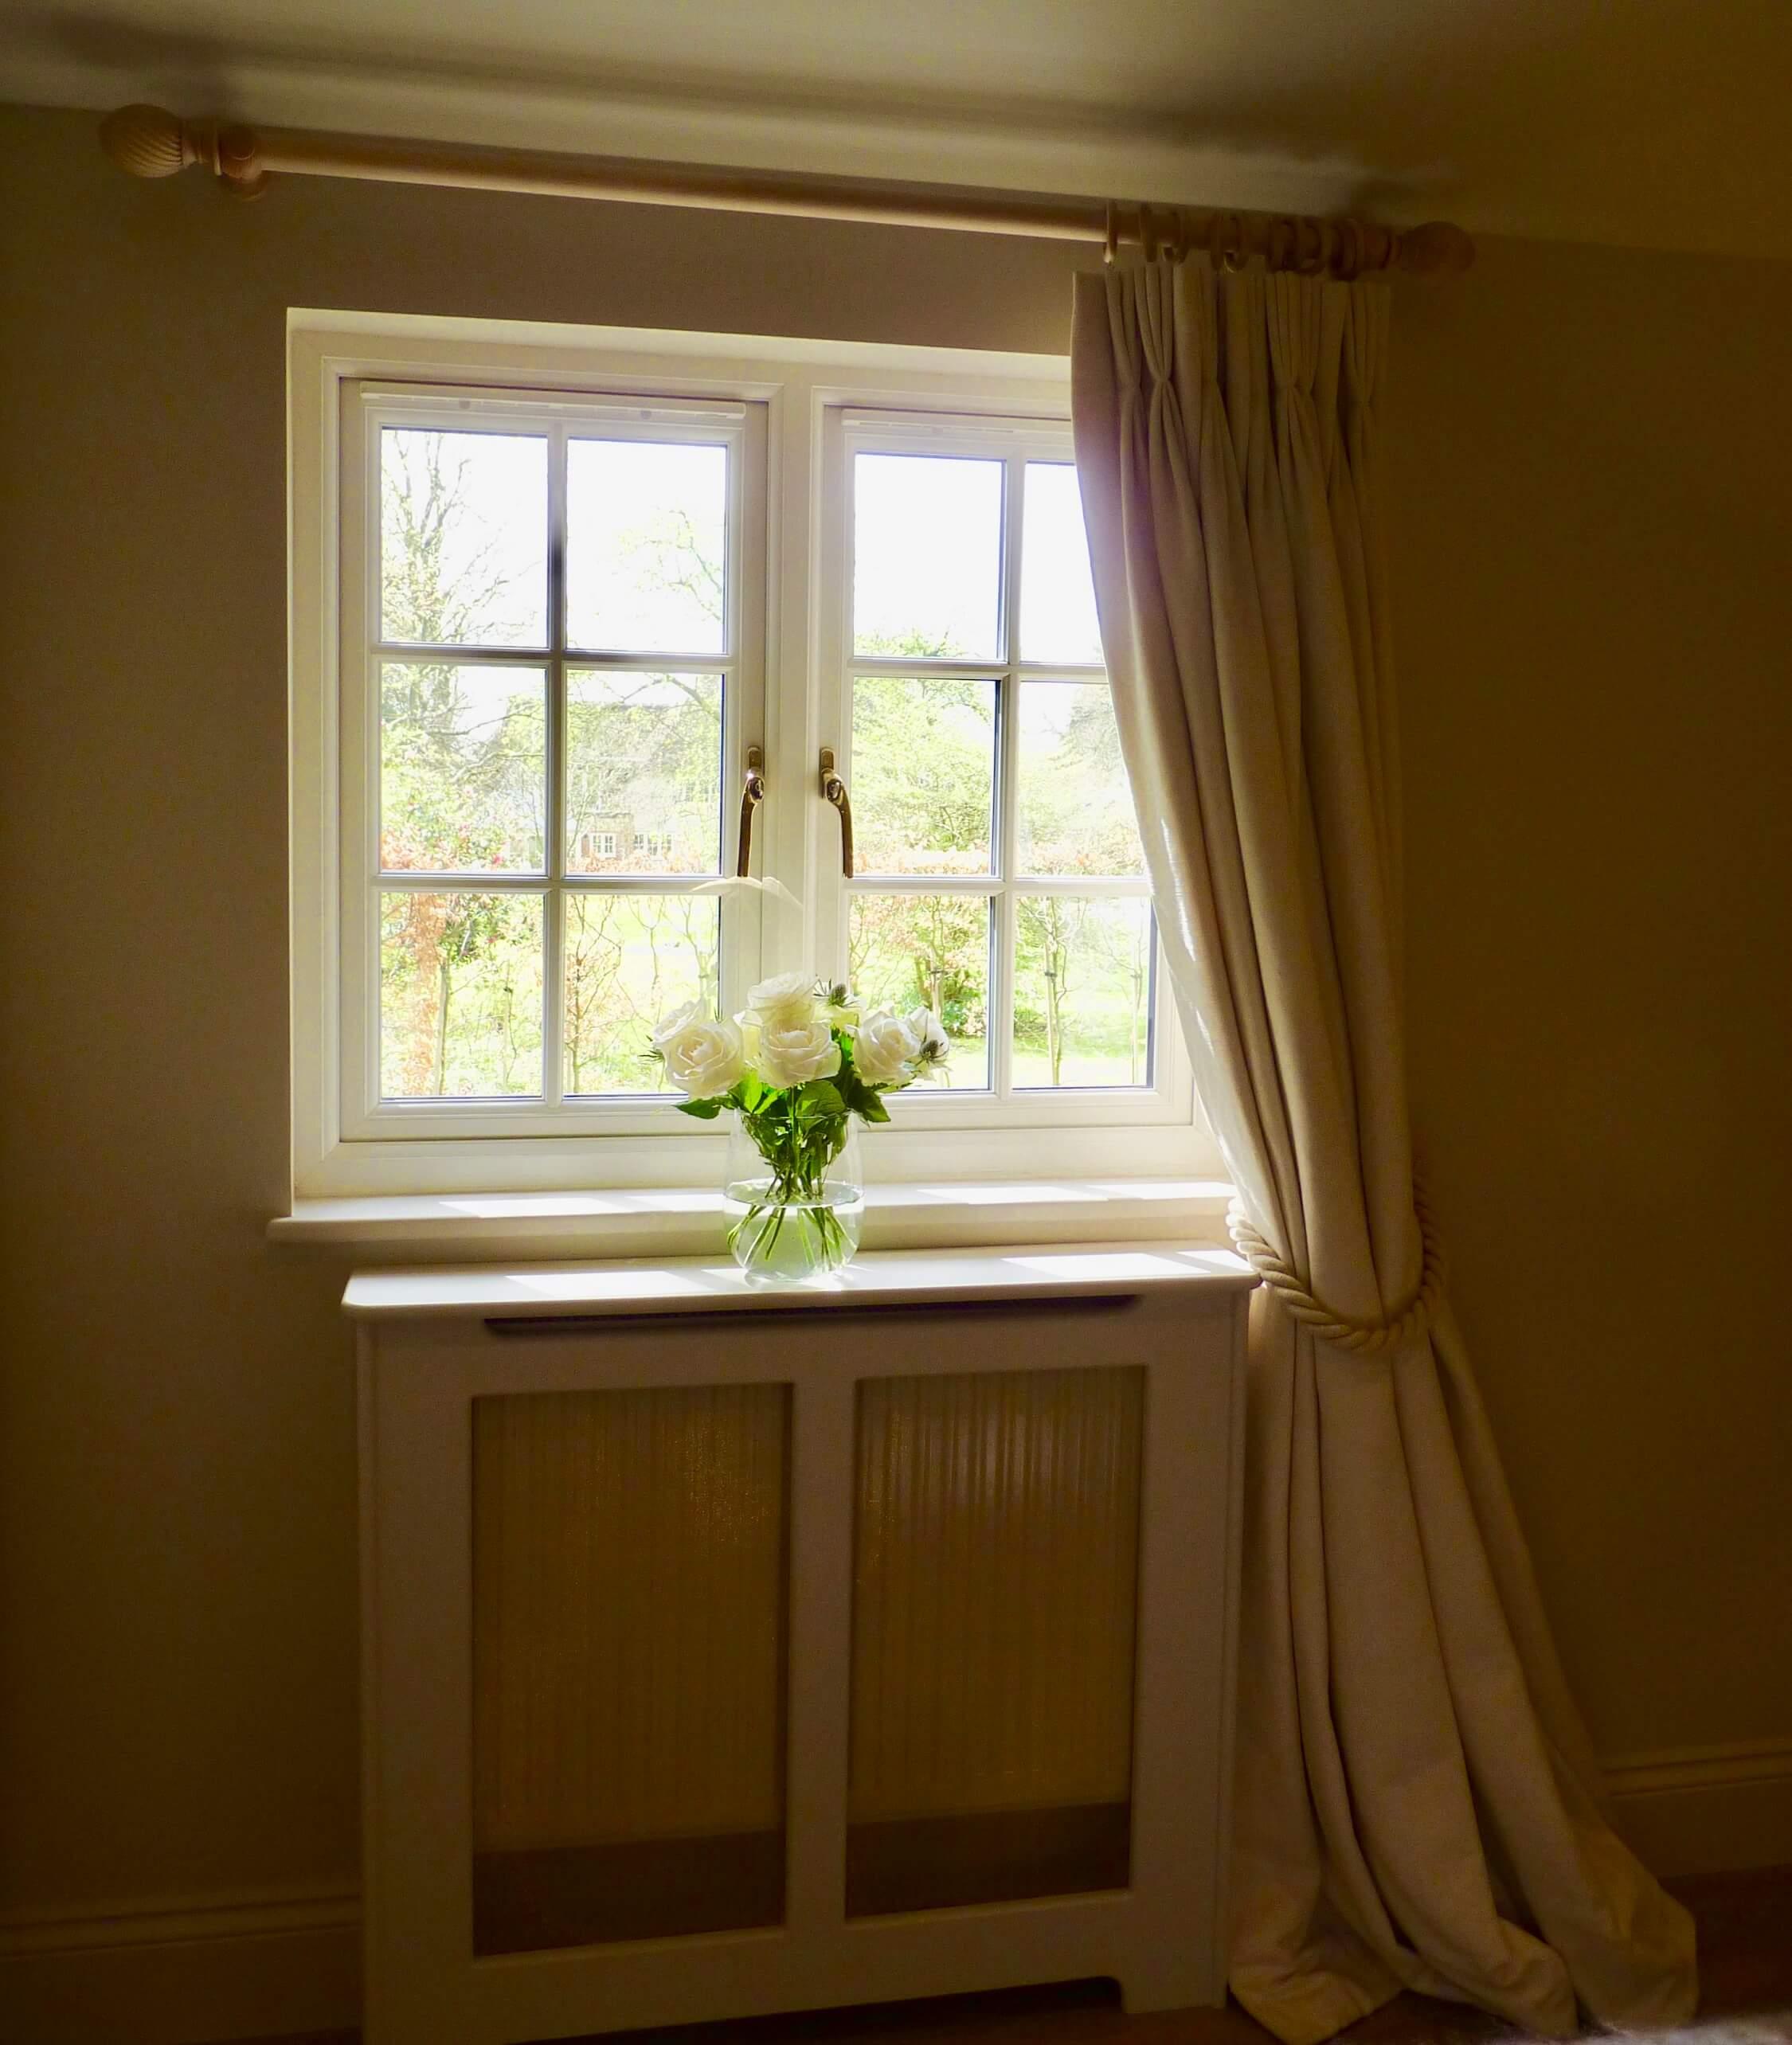 Window detailing